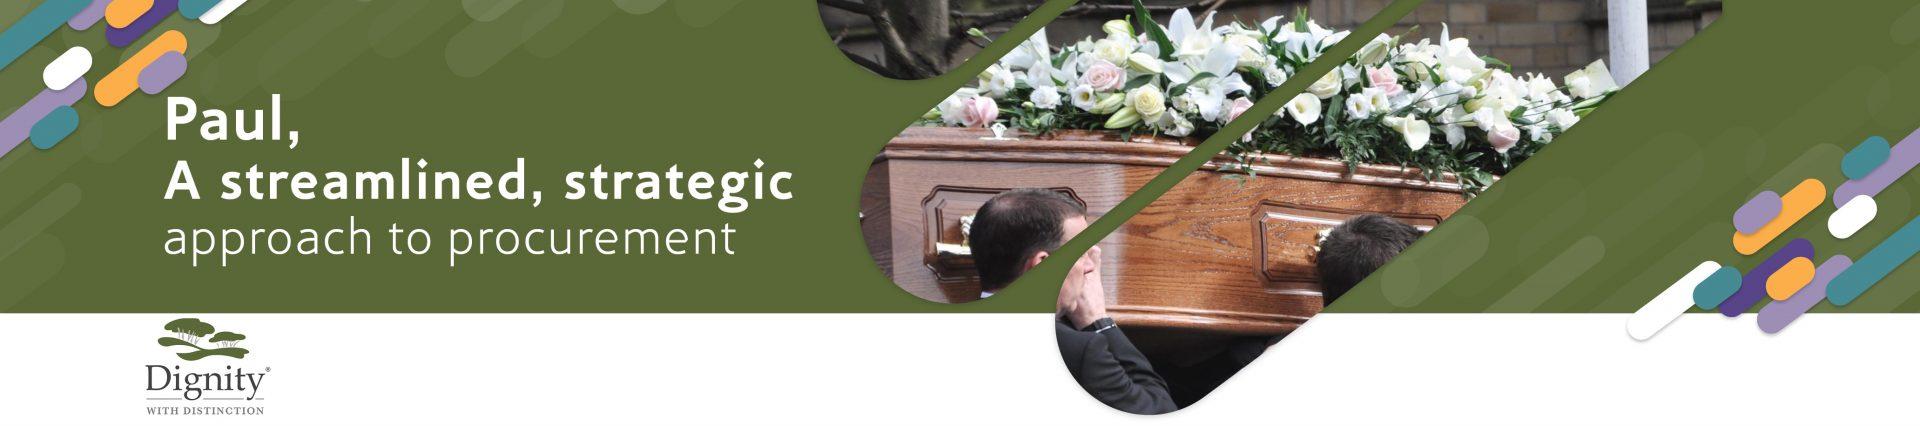 Dignity Funerals